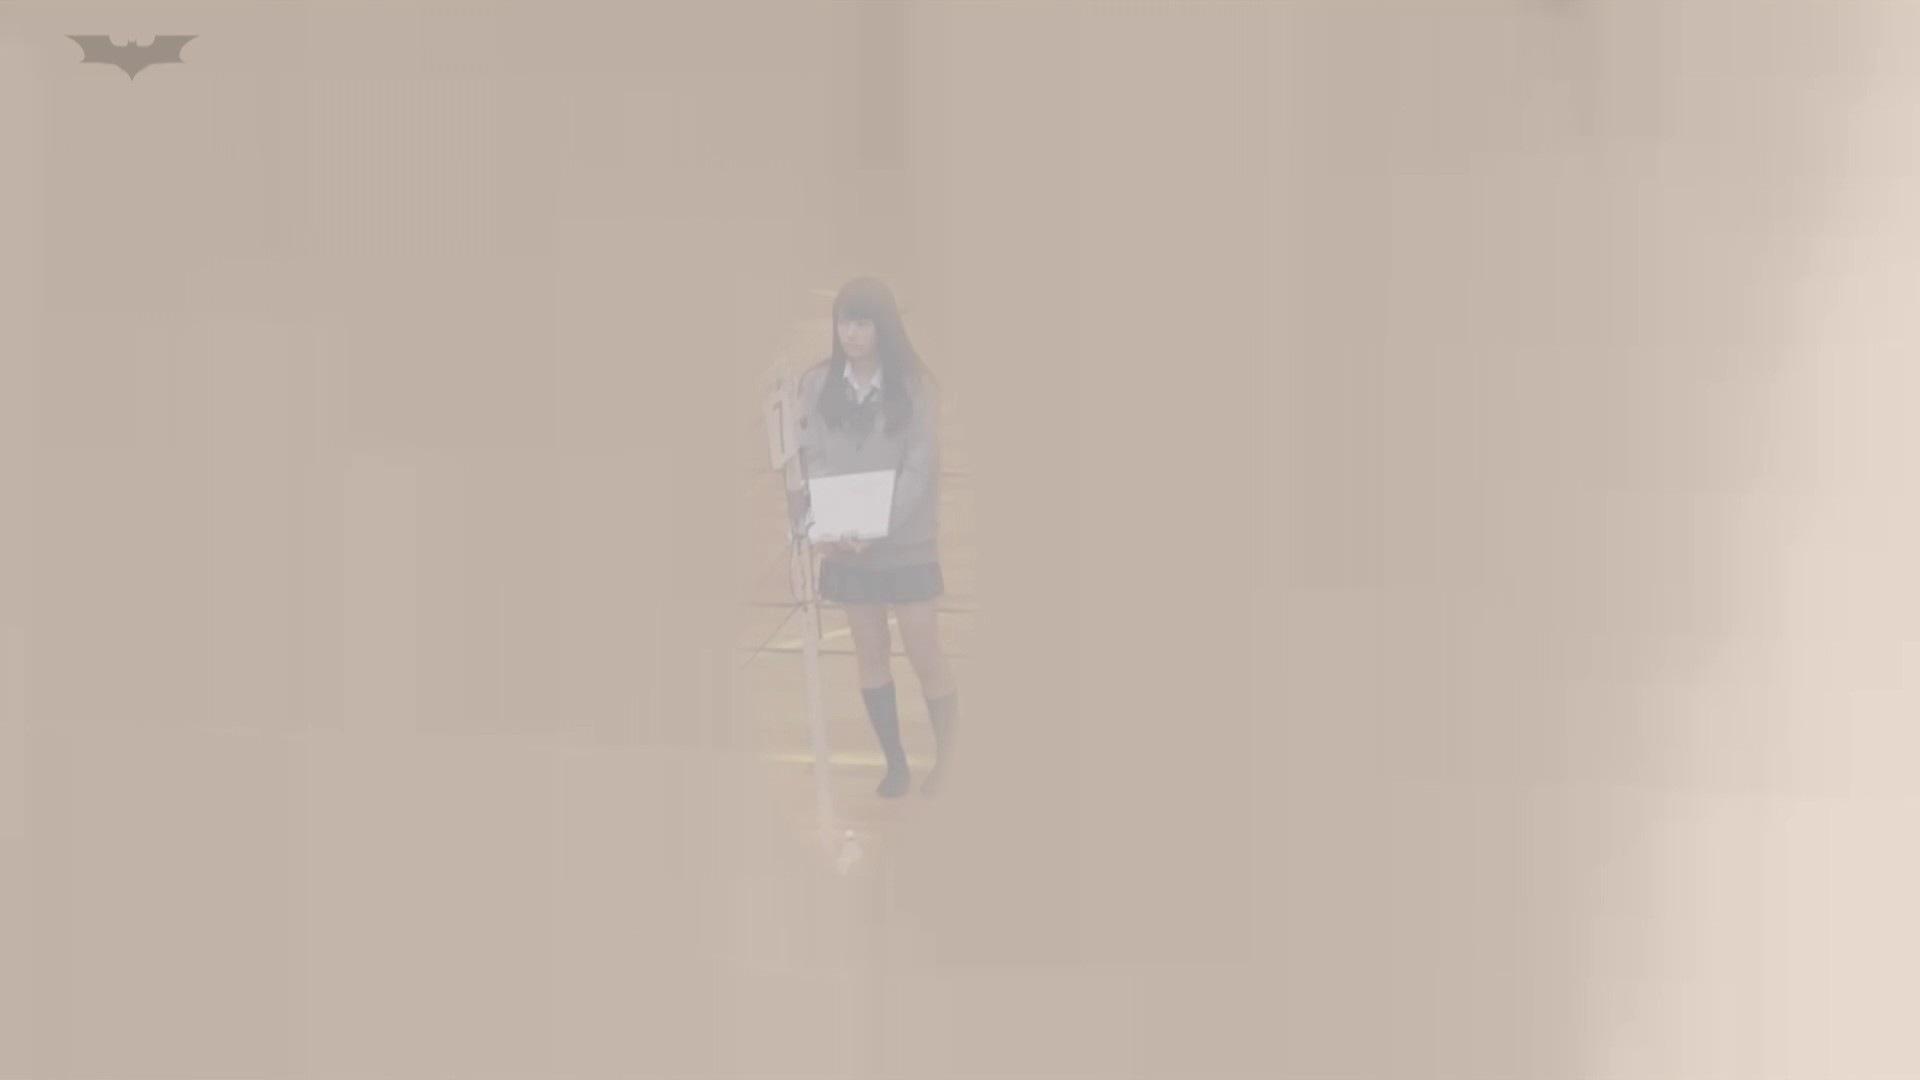 ▲復活限定D▲第三体育館潜入撮File018 夏帆に激似現役の未開発の下を 体育館 濡れ場動画紹介 19連発 2